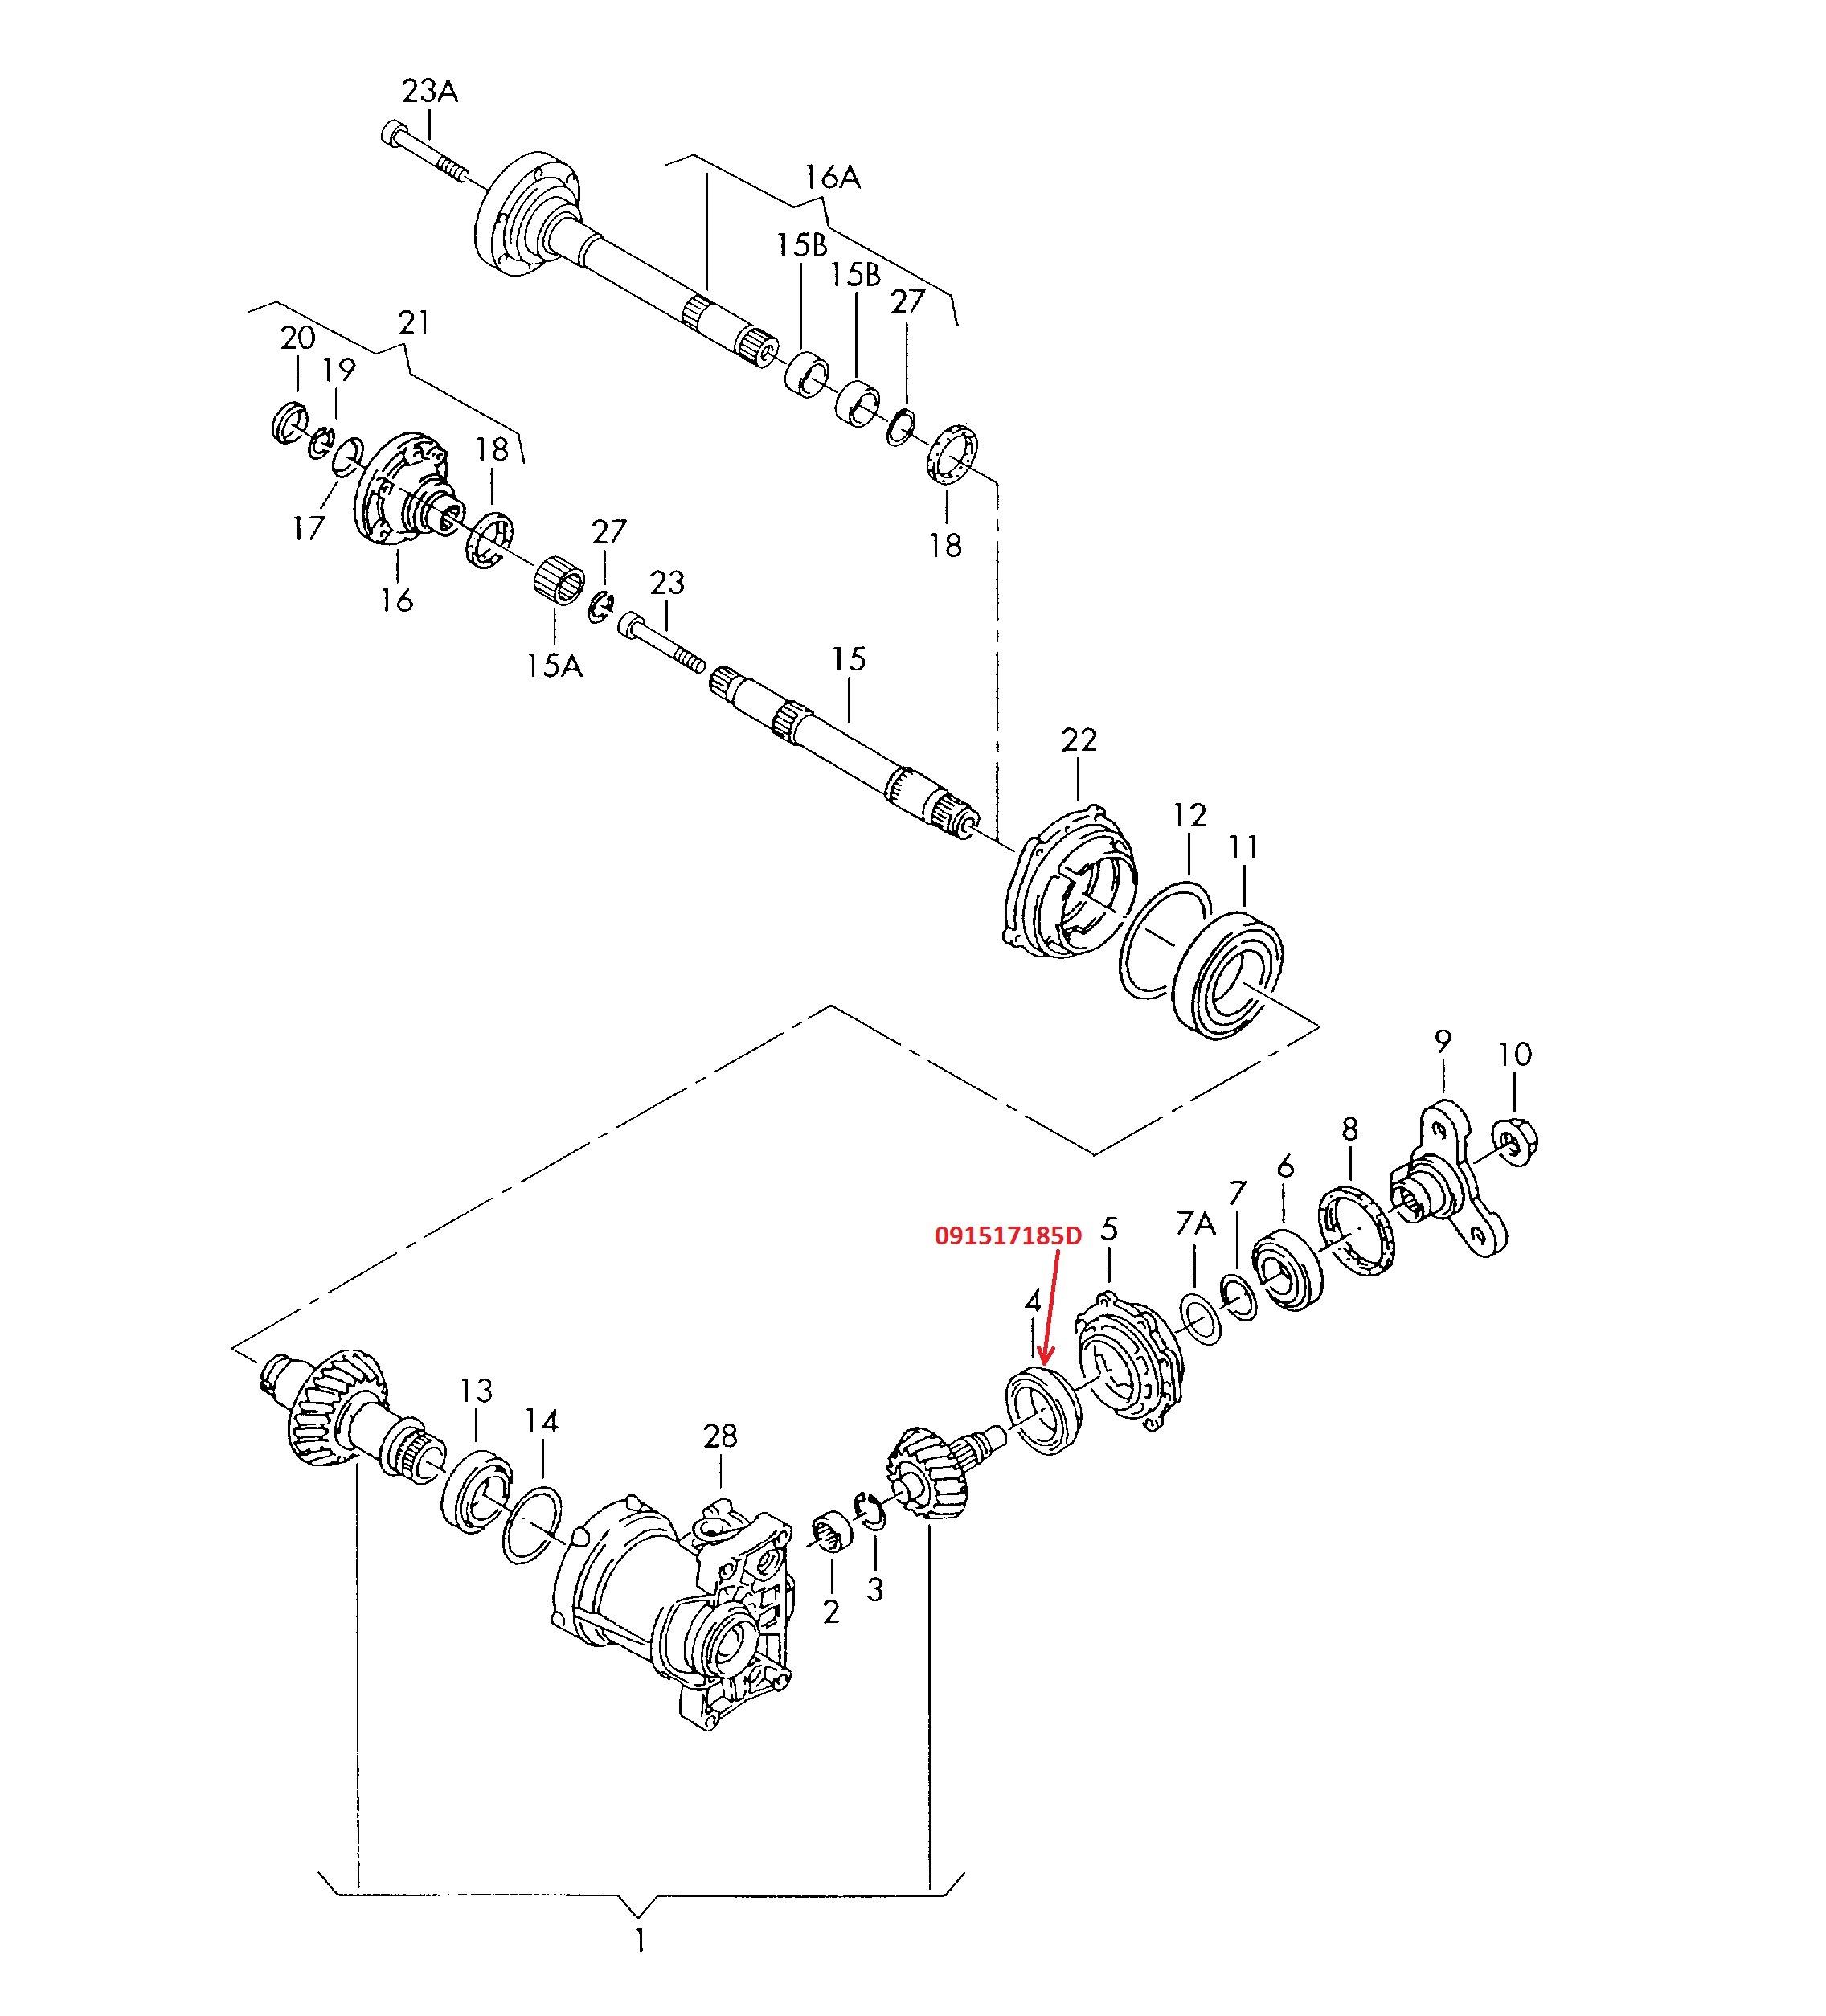 Wiring Diagram Jetta A4 Gratis En Espaol